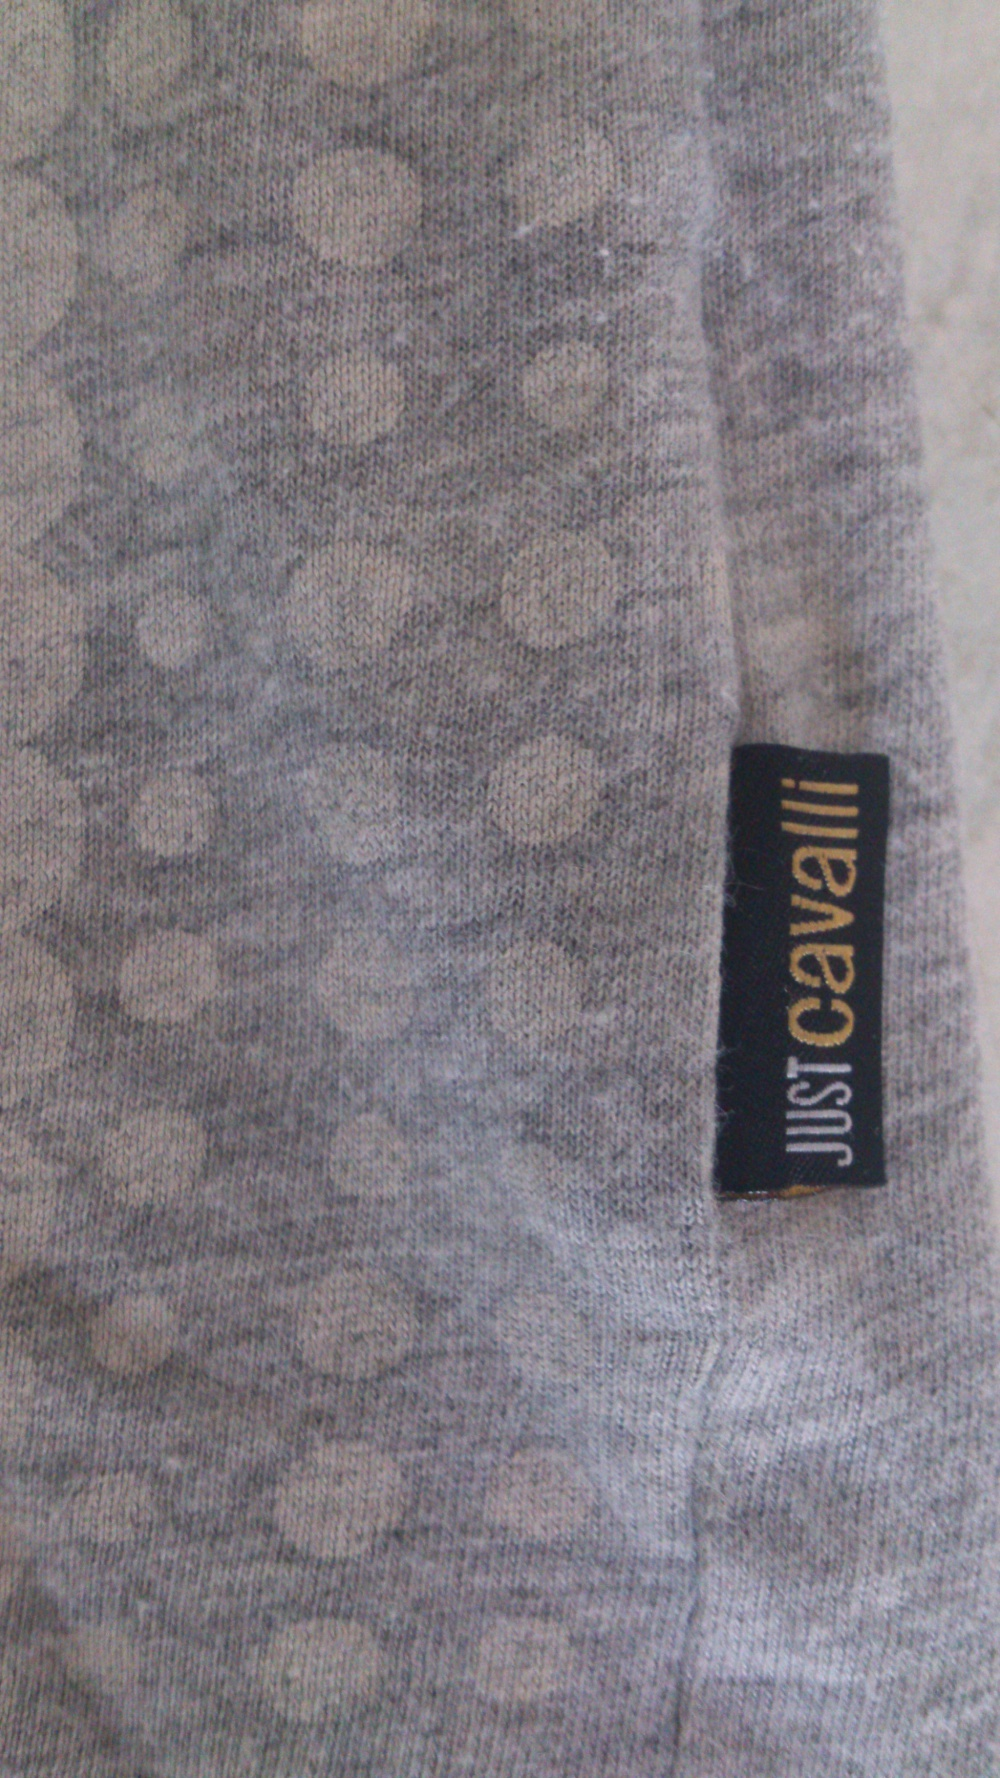 Кофта мужская Just Cavalli XL